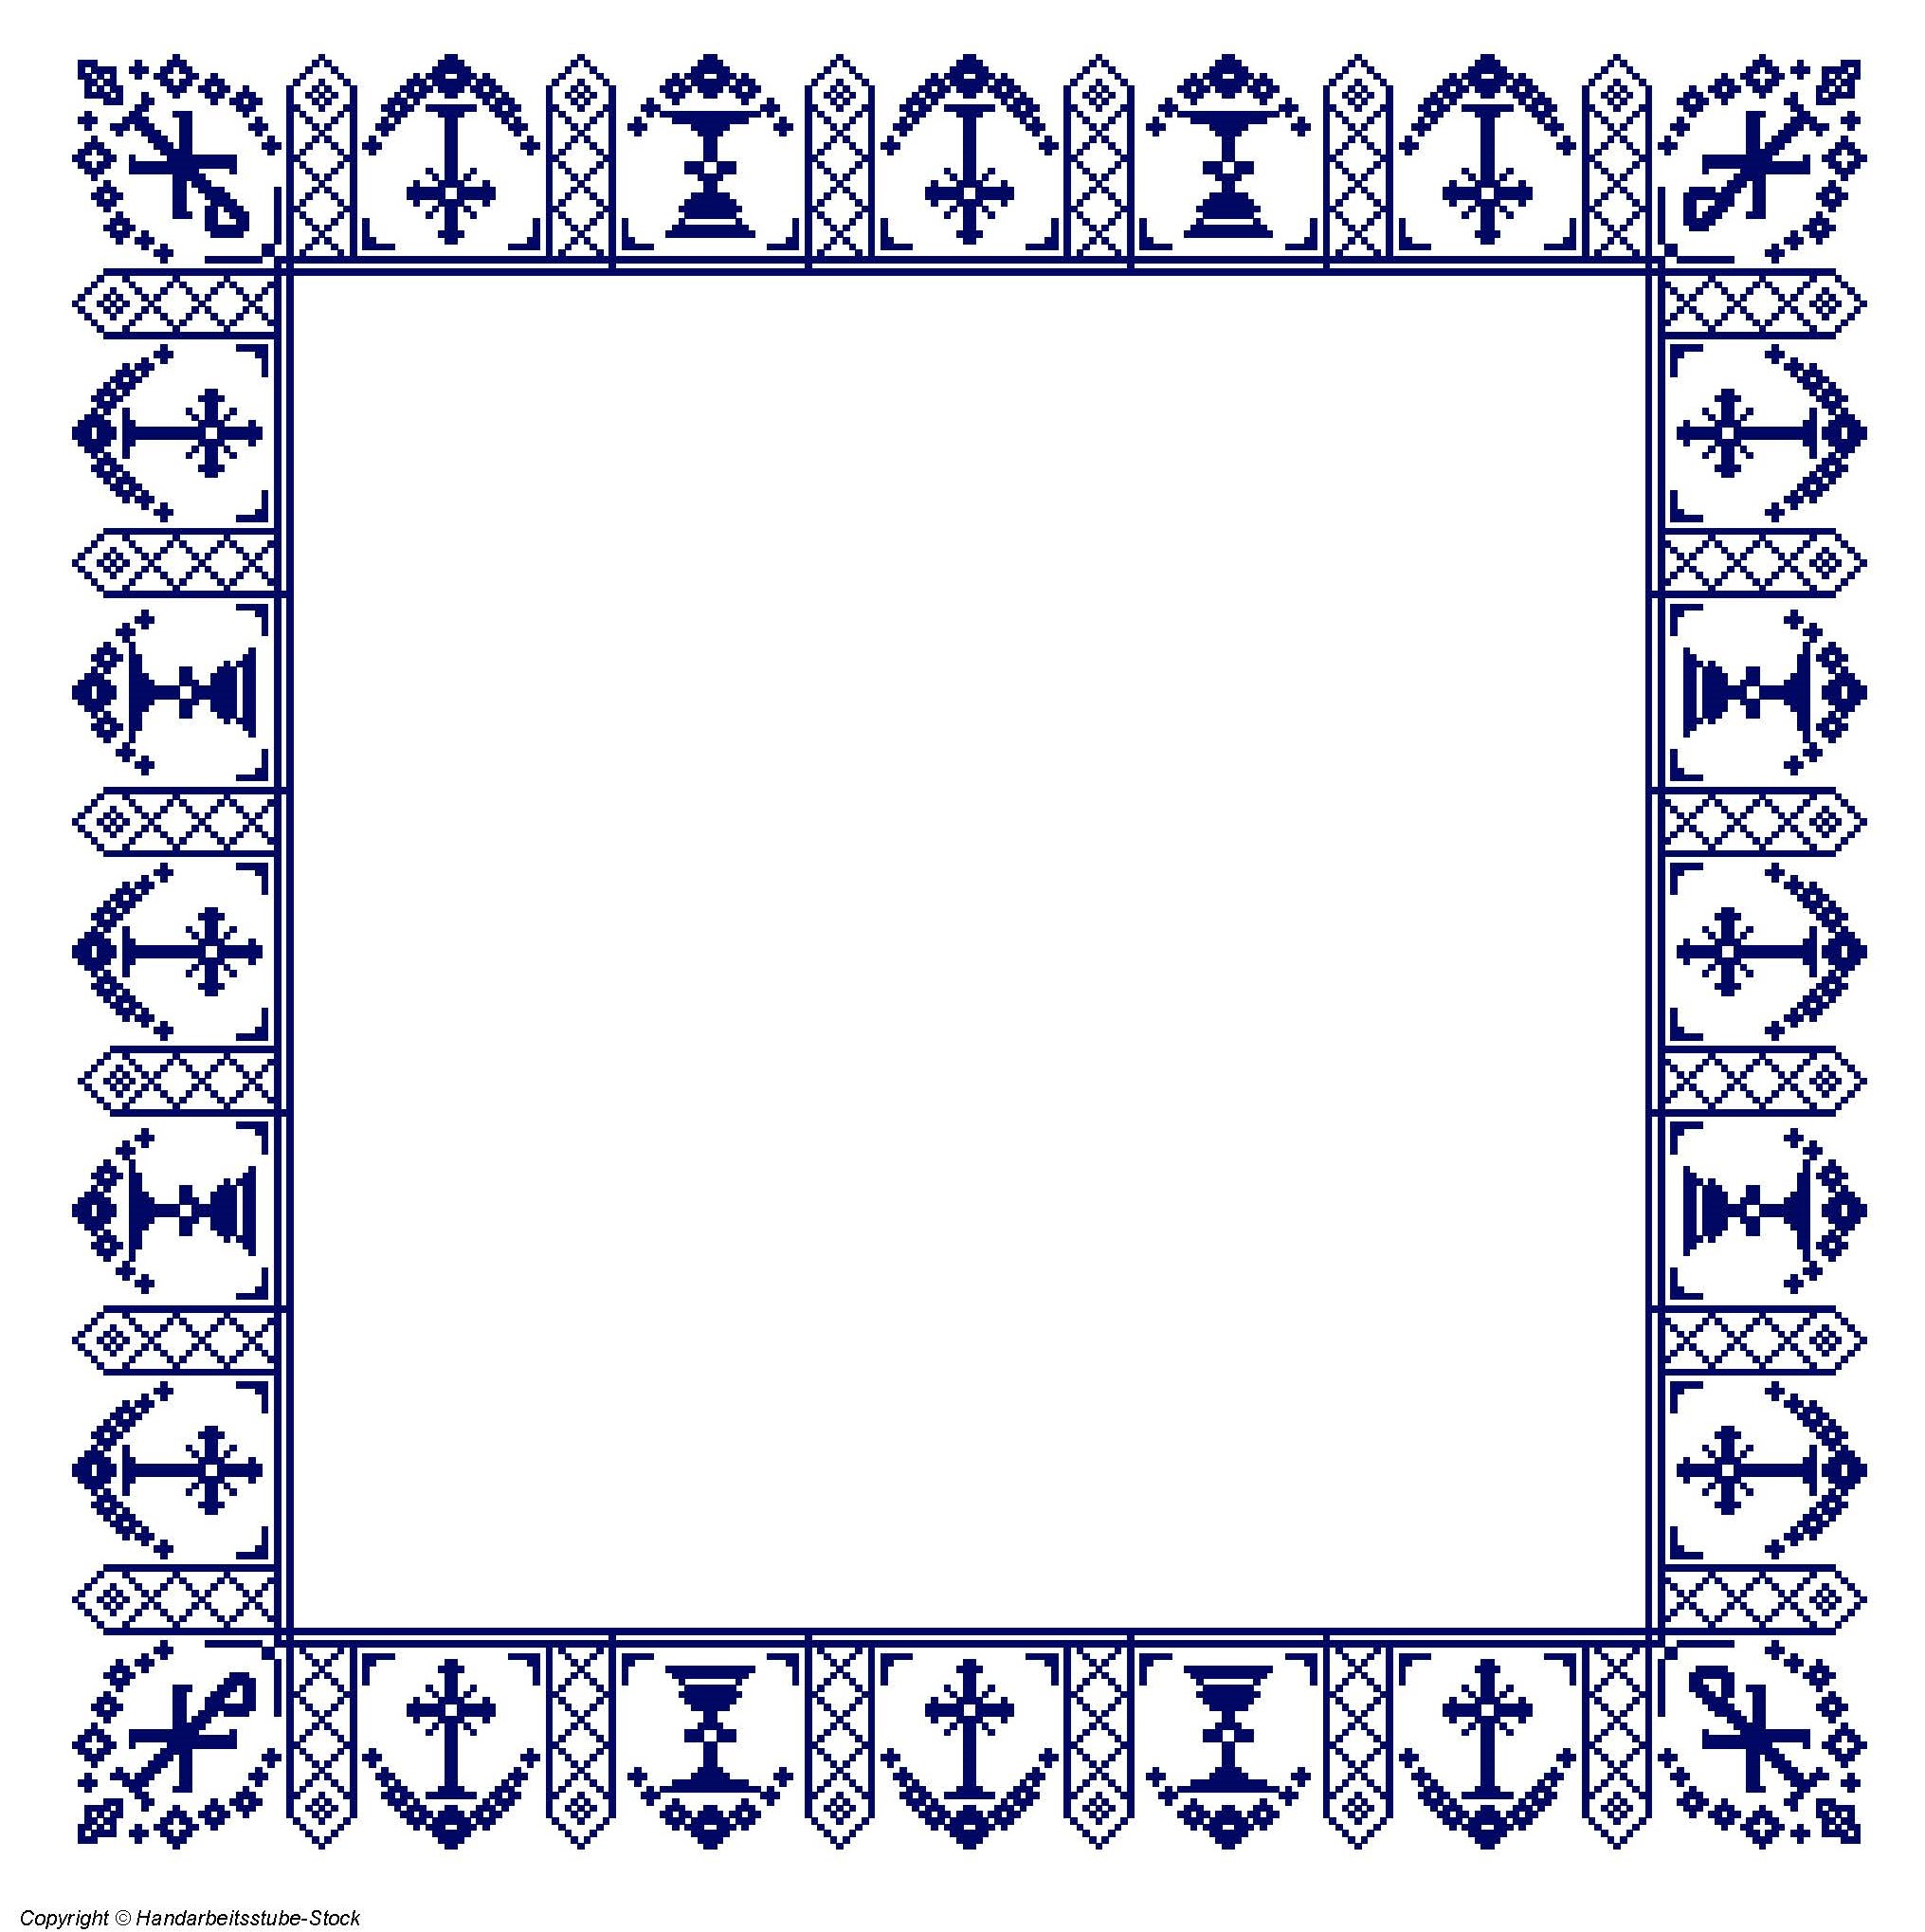 Altartuch - Bordüre 7